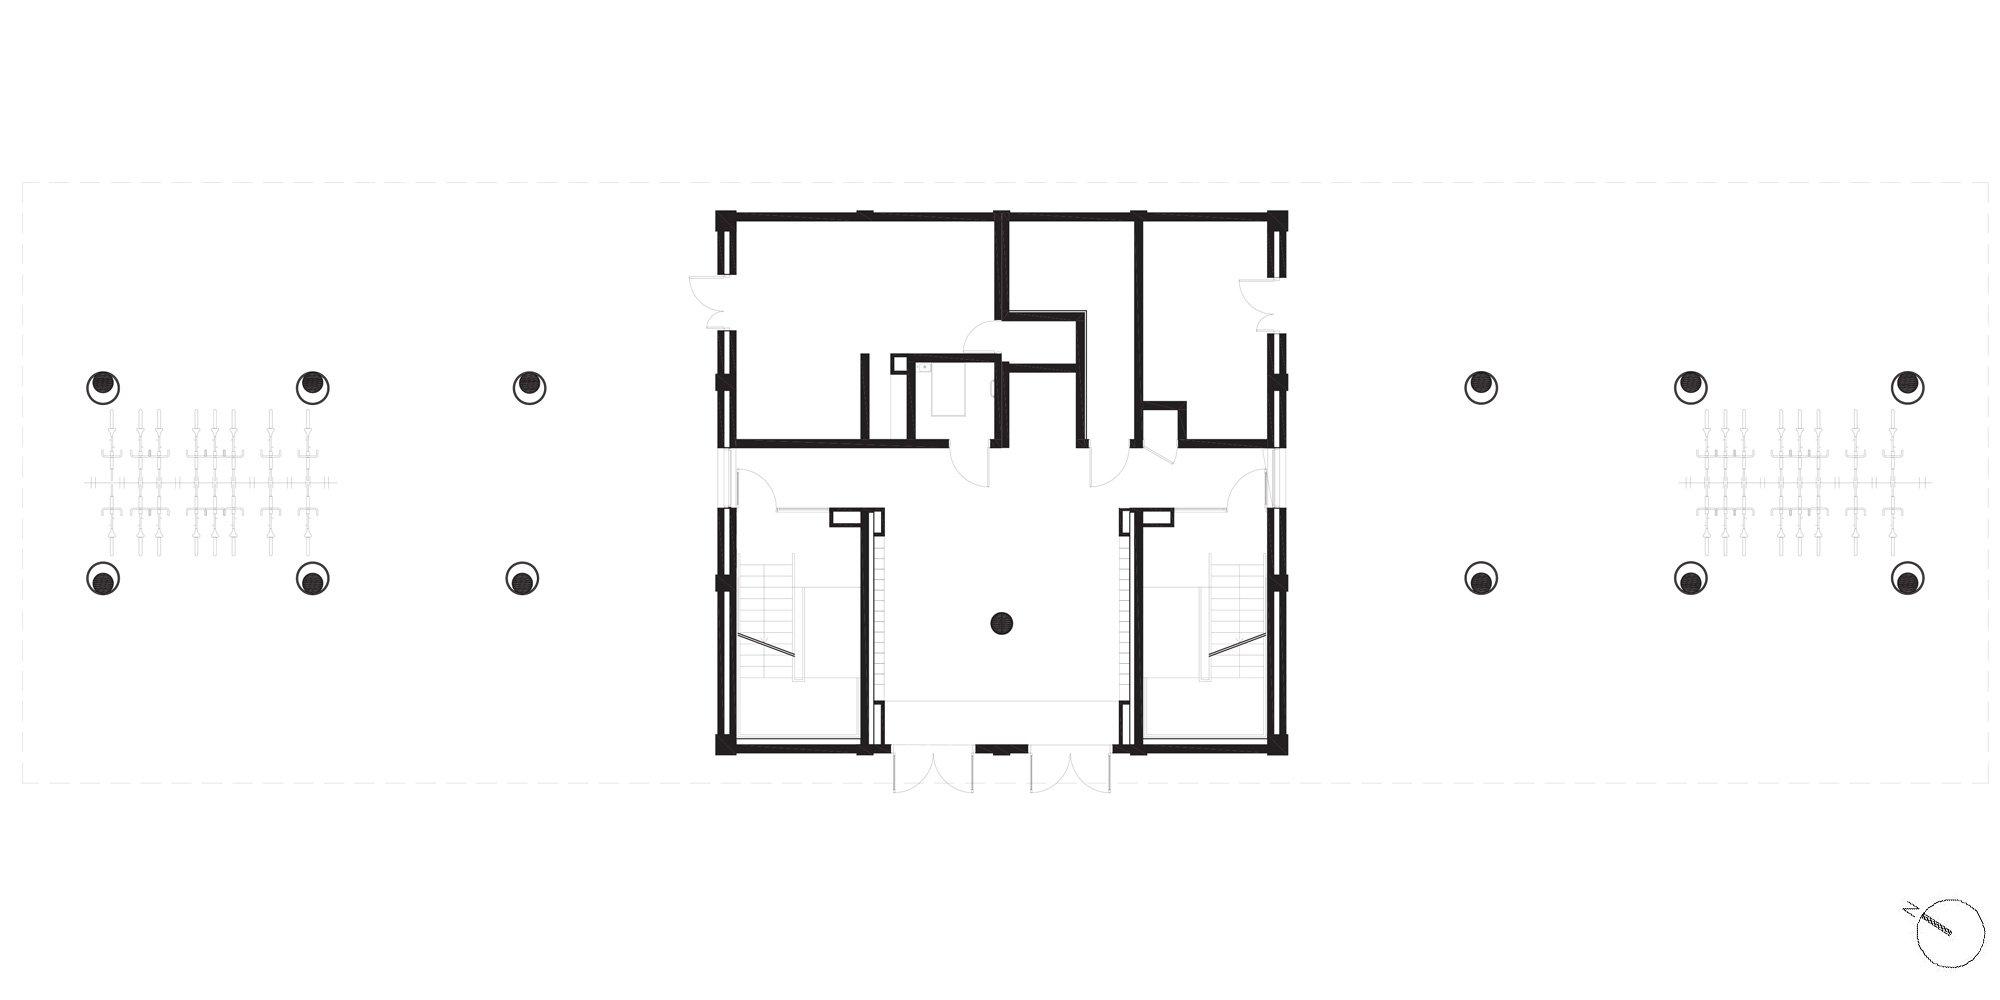 Groundfloor Plan © Martin Duplantier Architectes